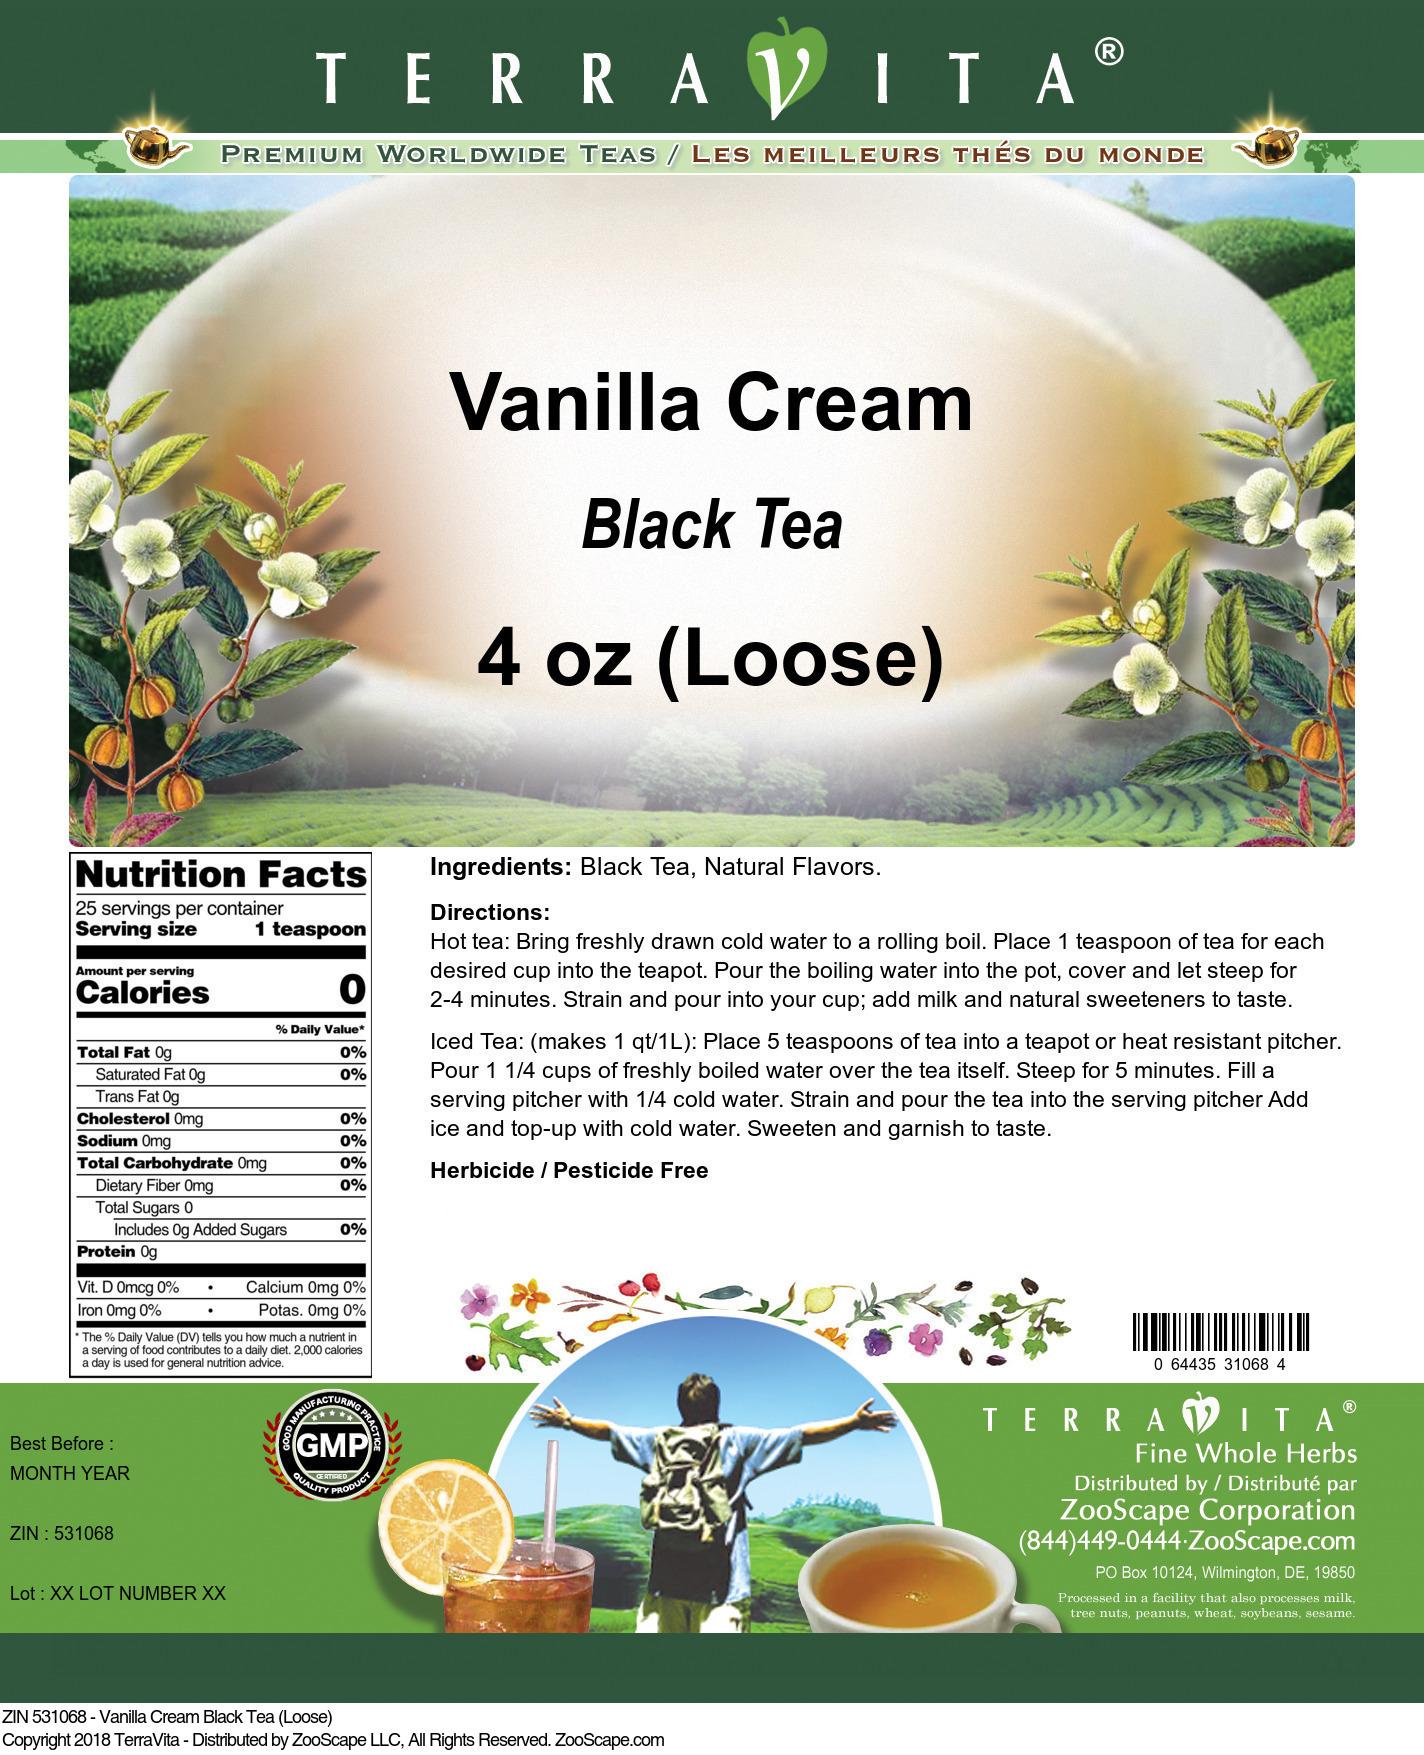 Vanilla Cream Black Tea (Loose)